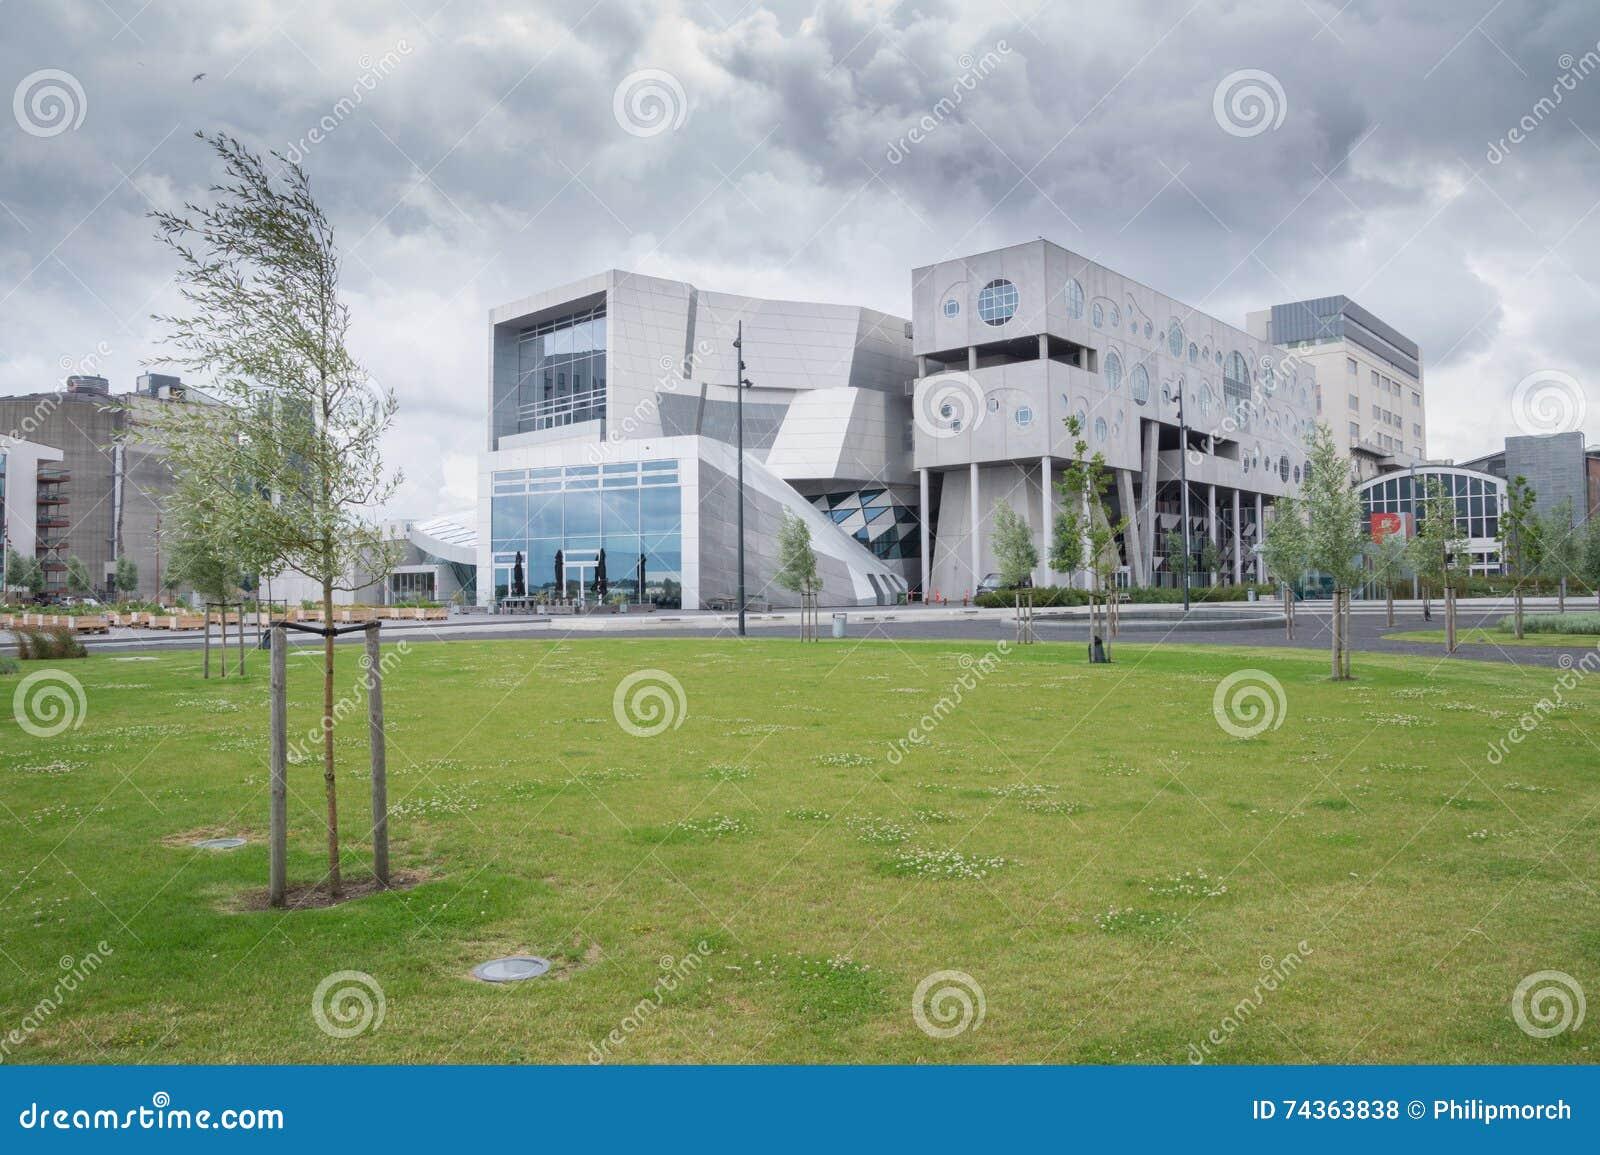 House Of Music Aalborg Denmark Stock Photo Image 74363838